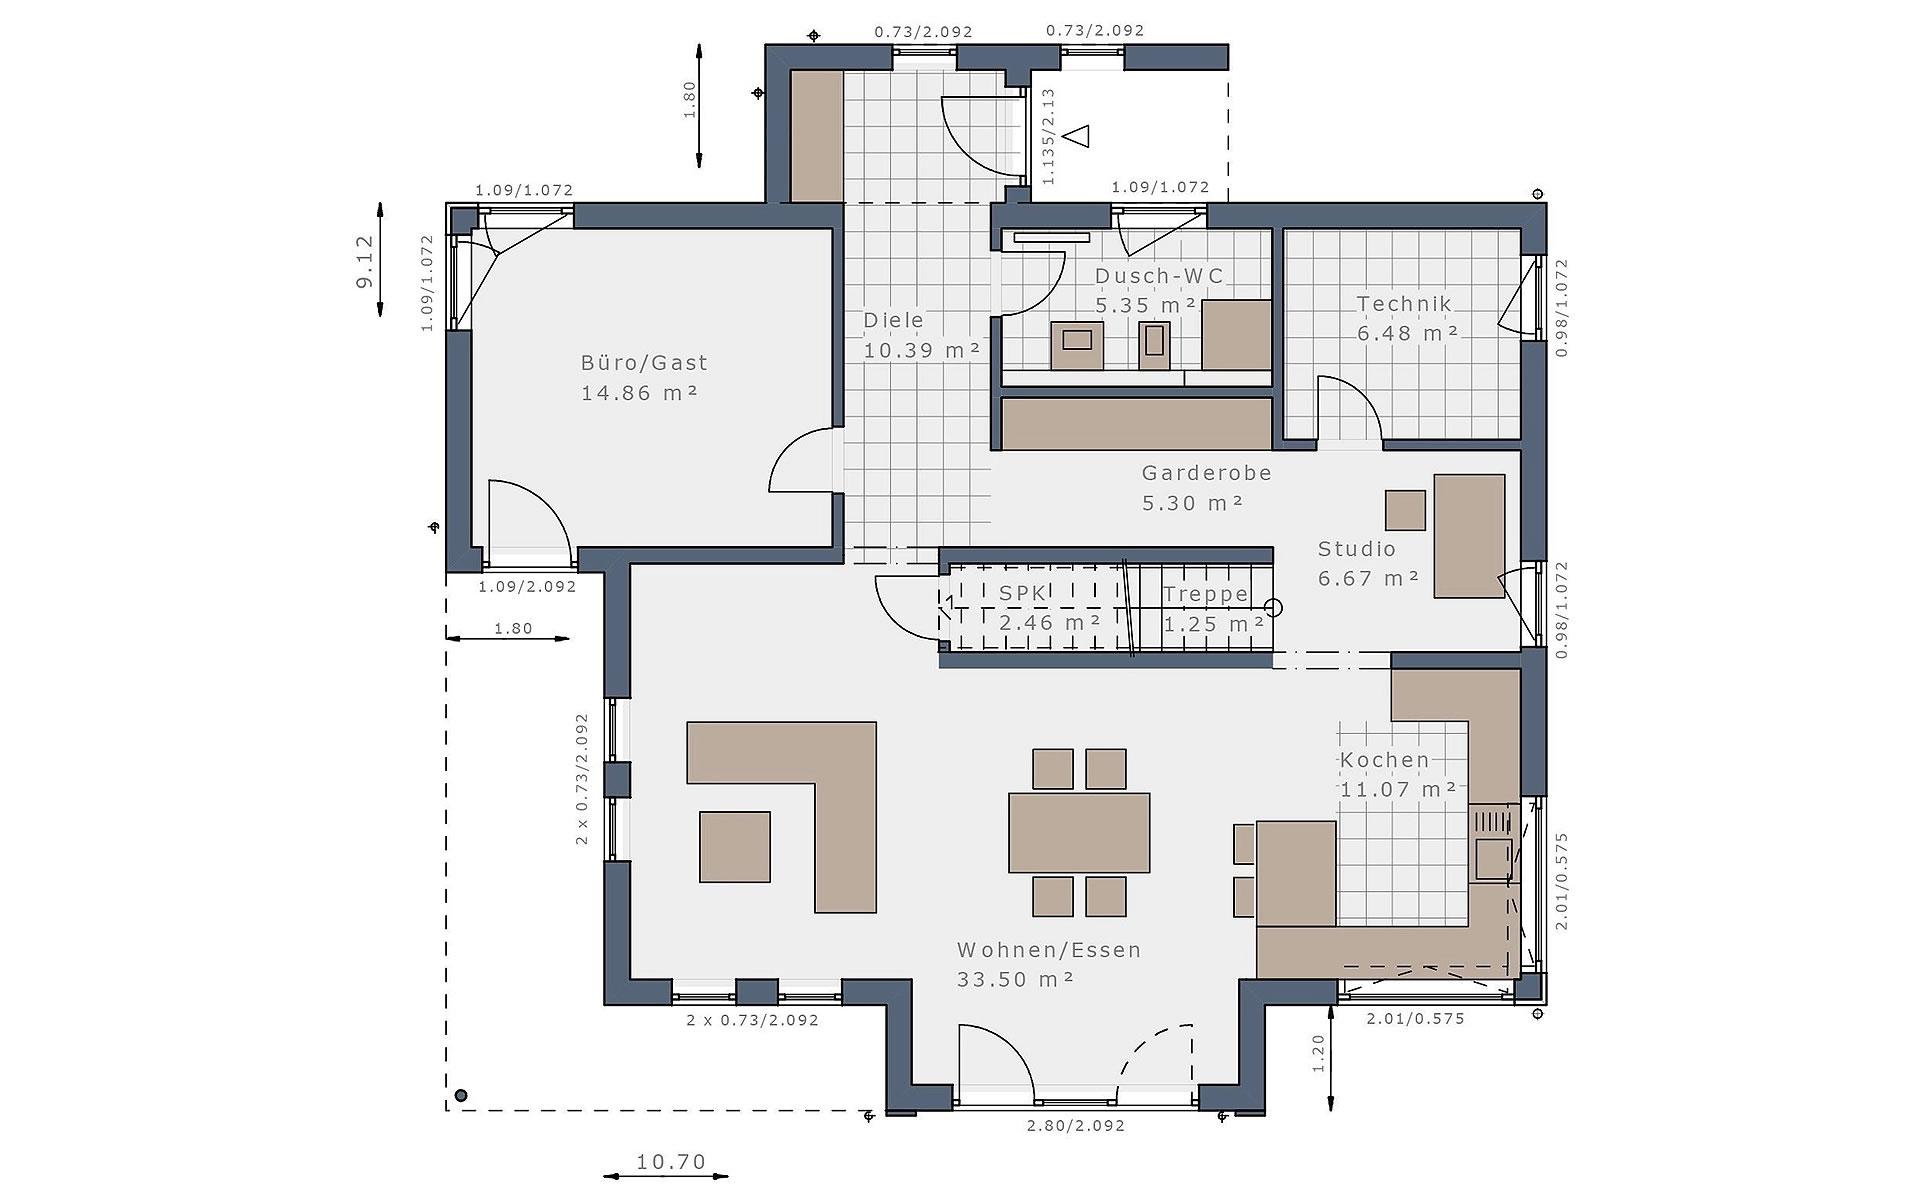 Erdgeschoss Solitaire-E-165 E3 von Schwabenhaus GmbH & Co. KG